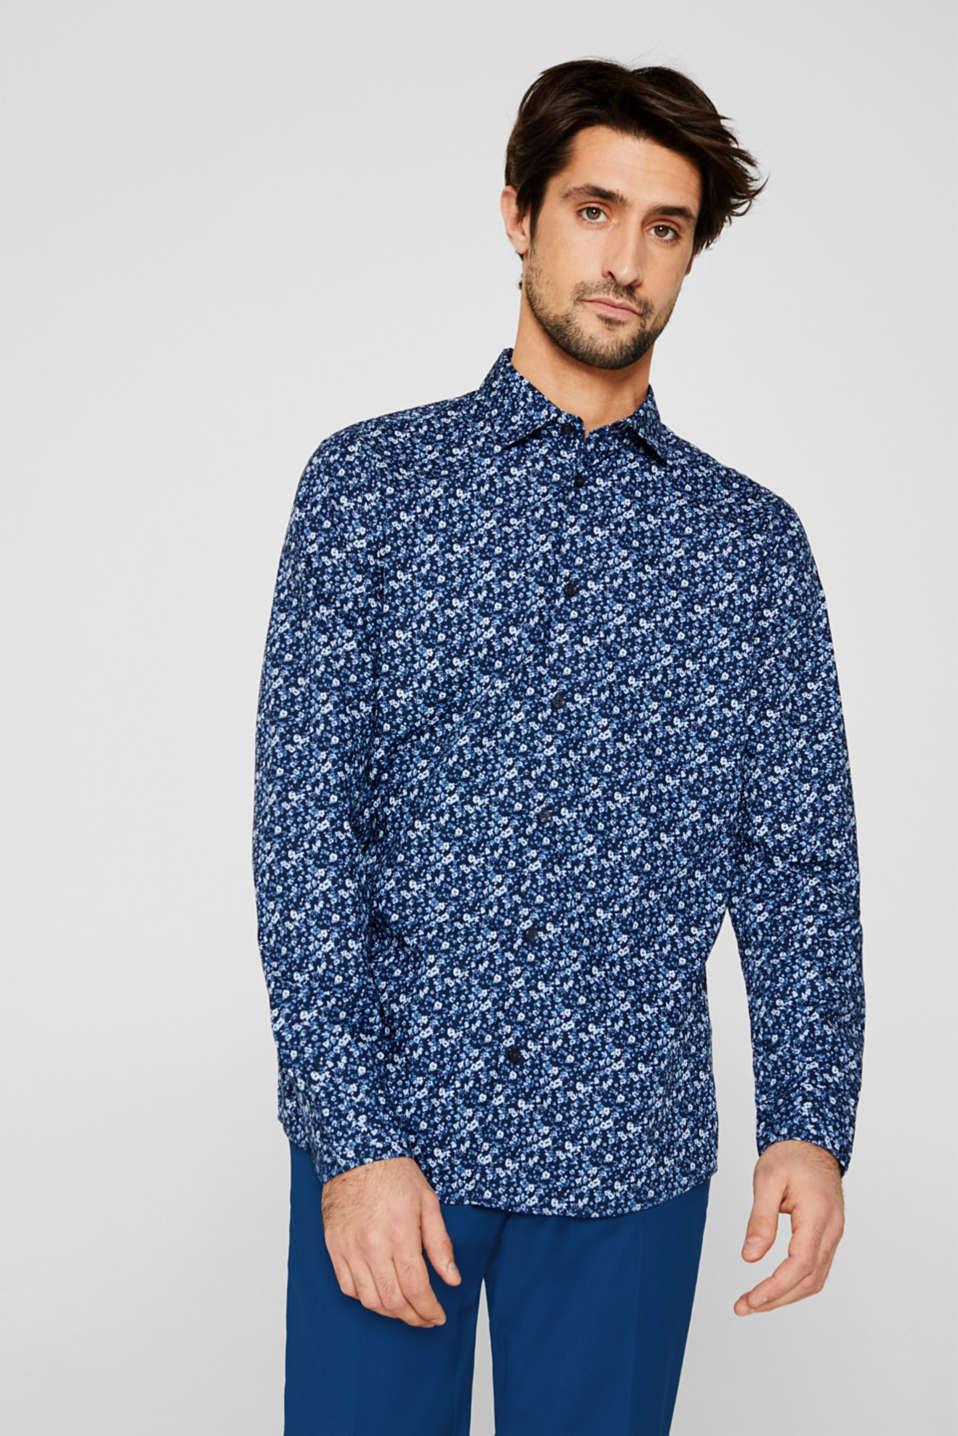 Premium shirt with a floral print, 100% cotton, DARK BLUE 4, detail image number 5